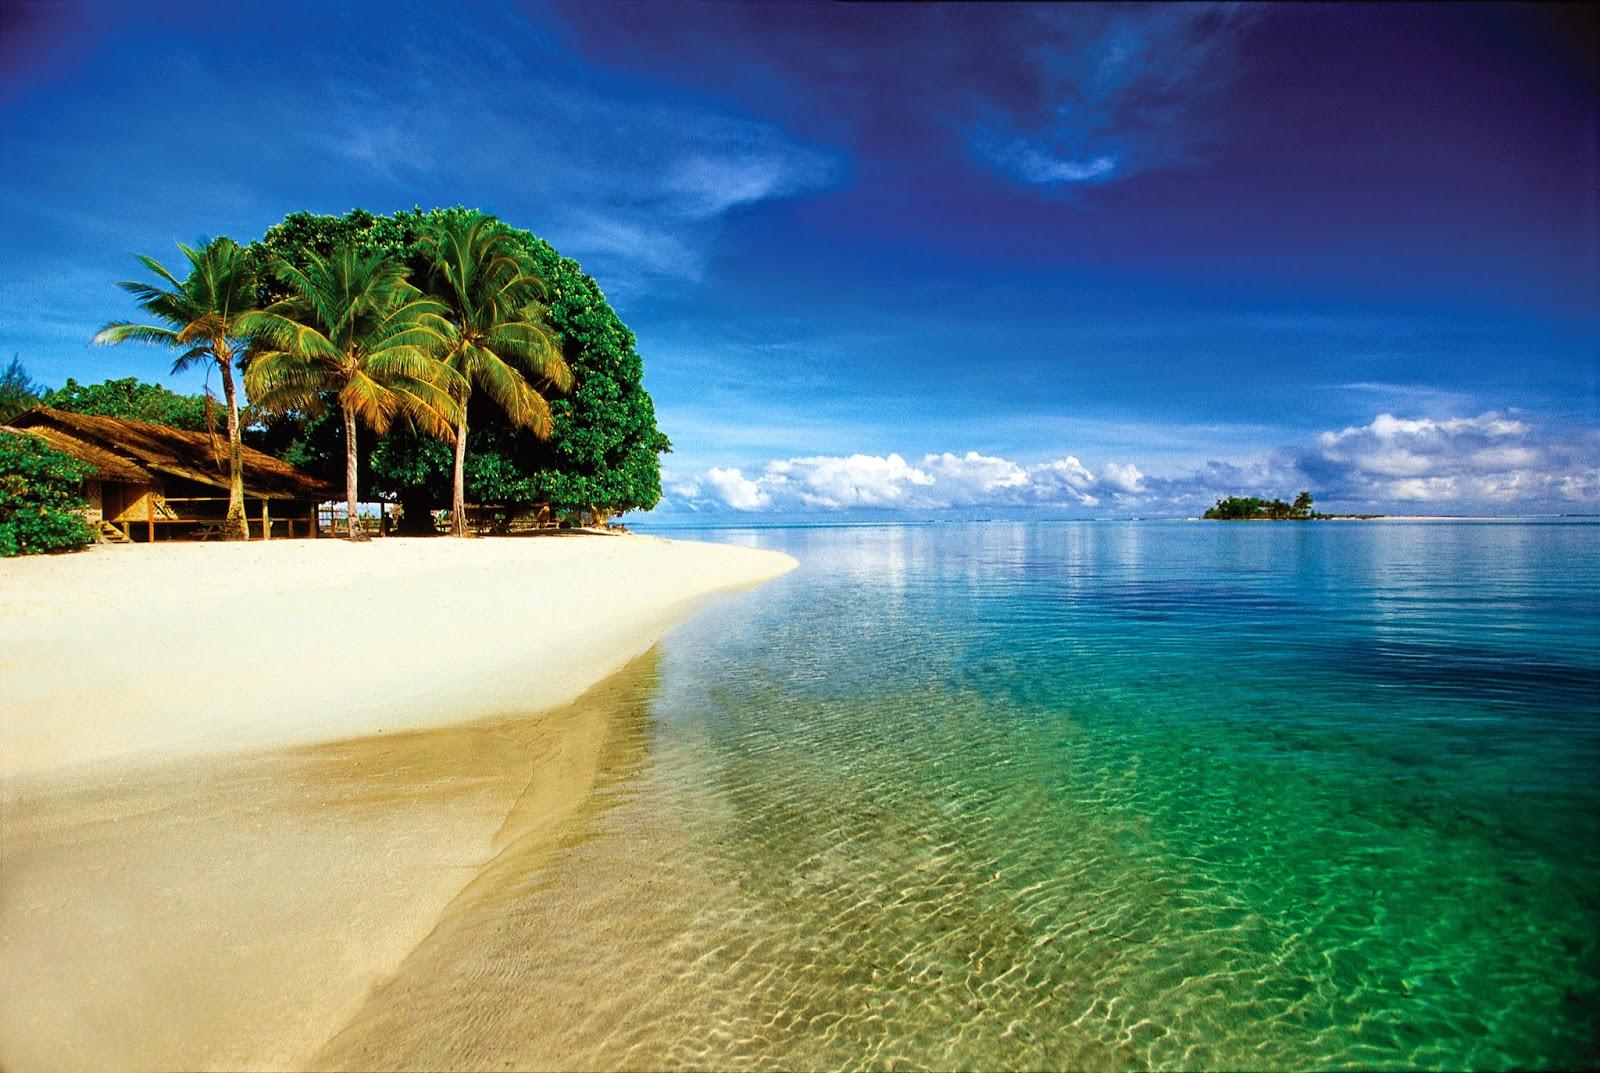 60e2d8378 A REMOTE ISLAND NEAR NEW IRELAND - Papua New Guinea